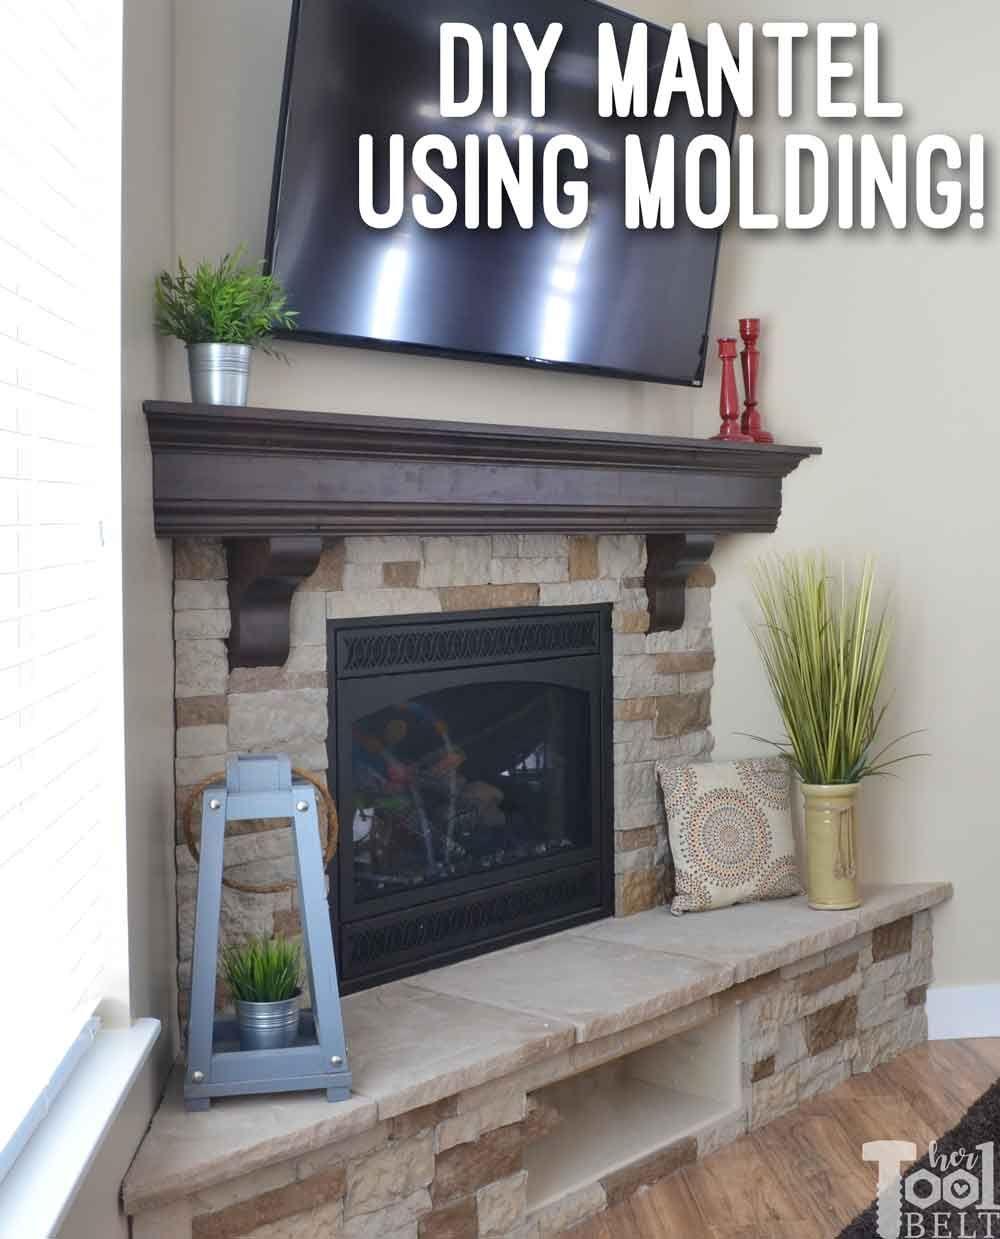 diy fireplace mantel shelf | a complete reno | pinterest | diy